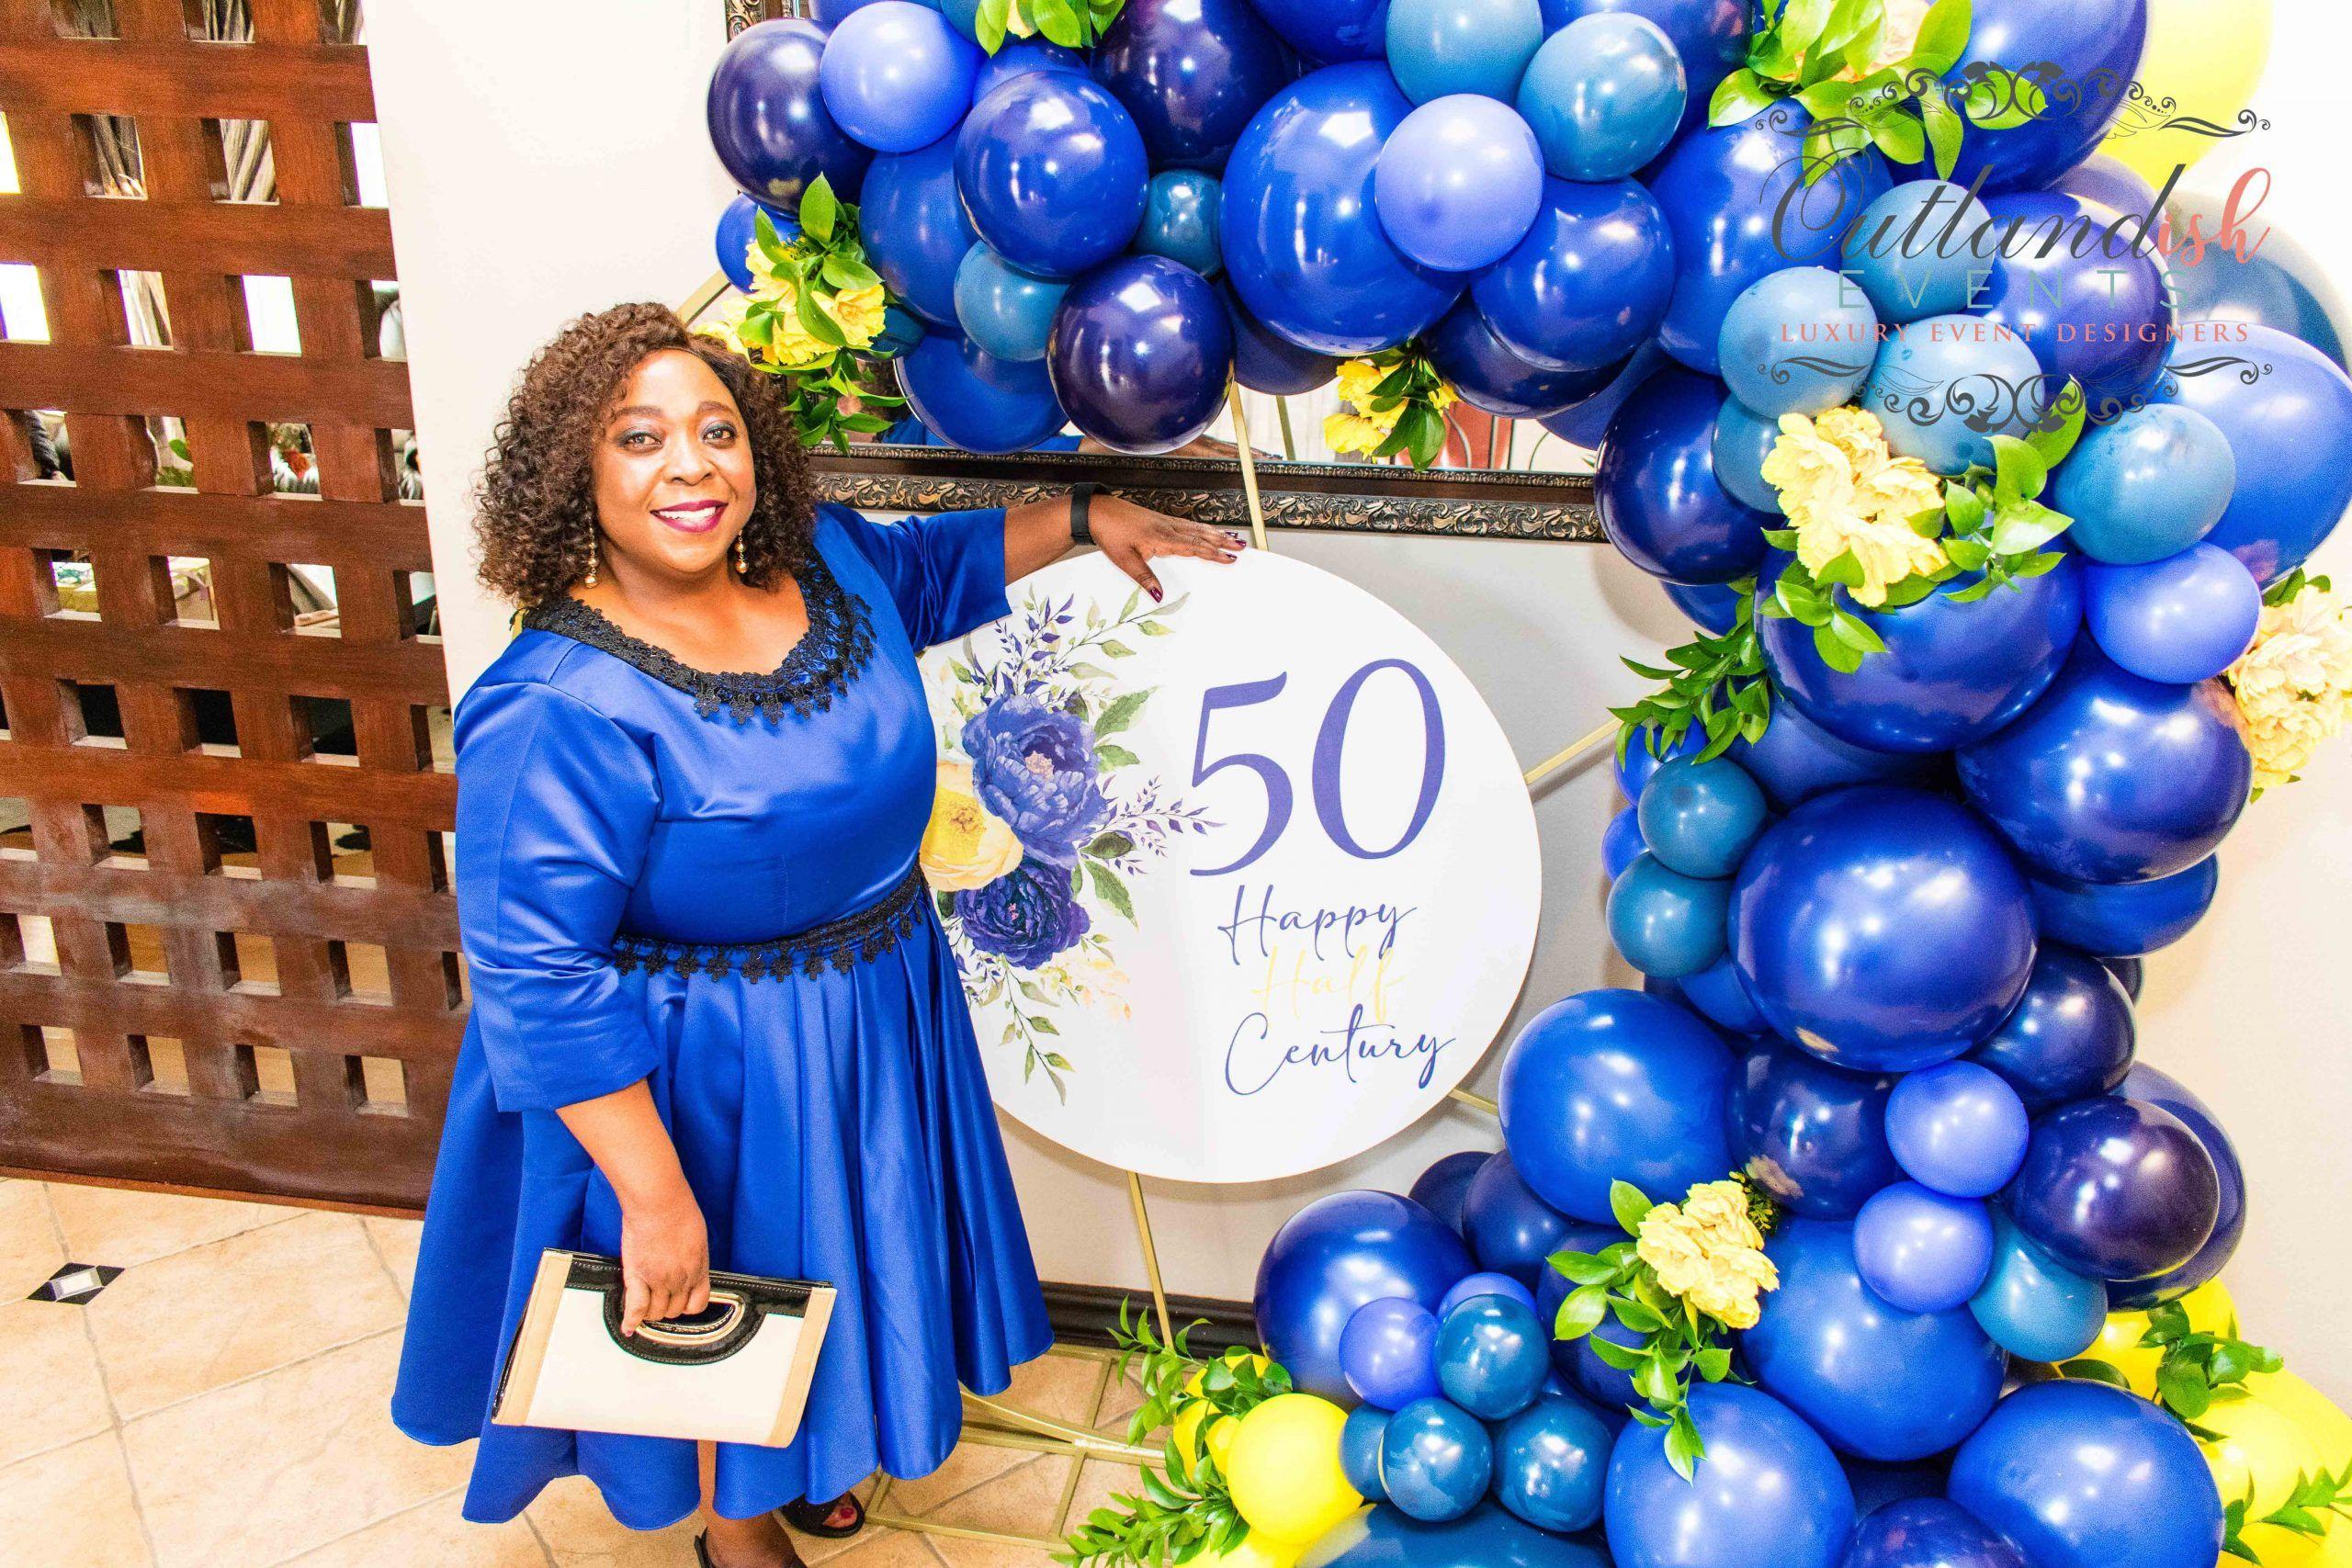 50th Birthday Home Celebration Photoshoot 50th Birthday Birthday 50th Birthday Party